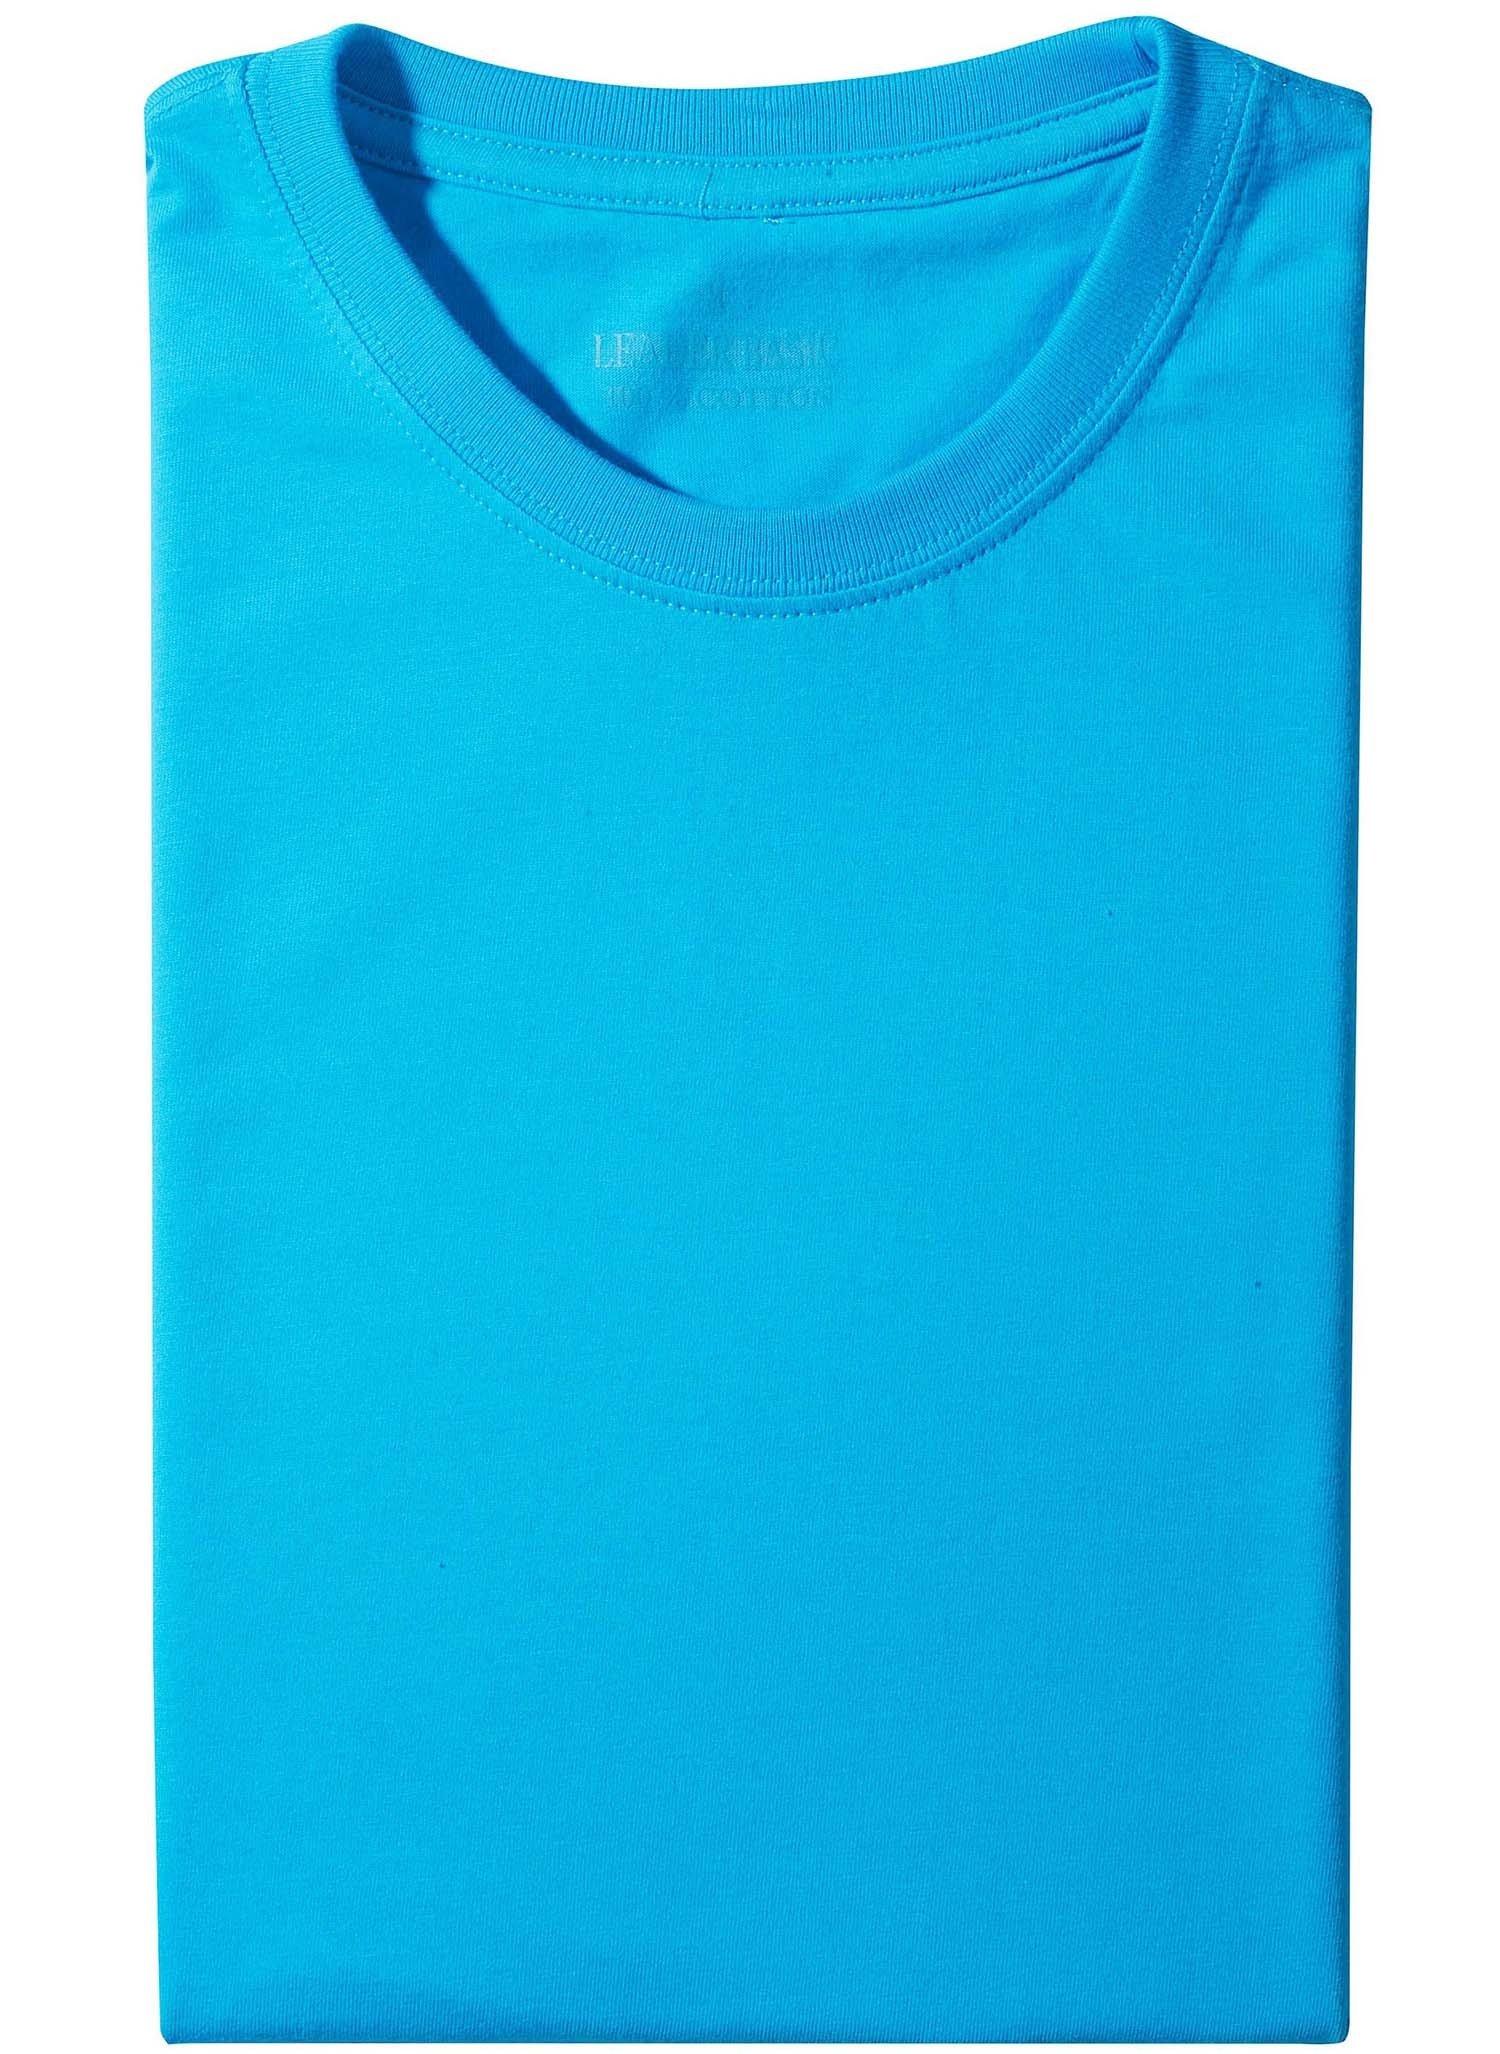 U-Duo-Pack-Shirt türkis XXXL 069 - 1 - Ronja.ch